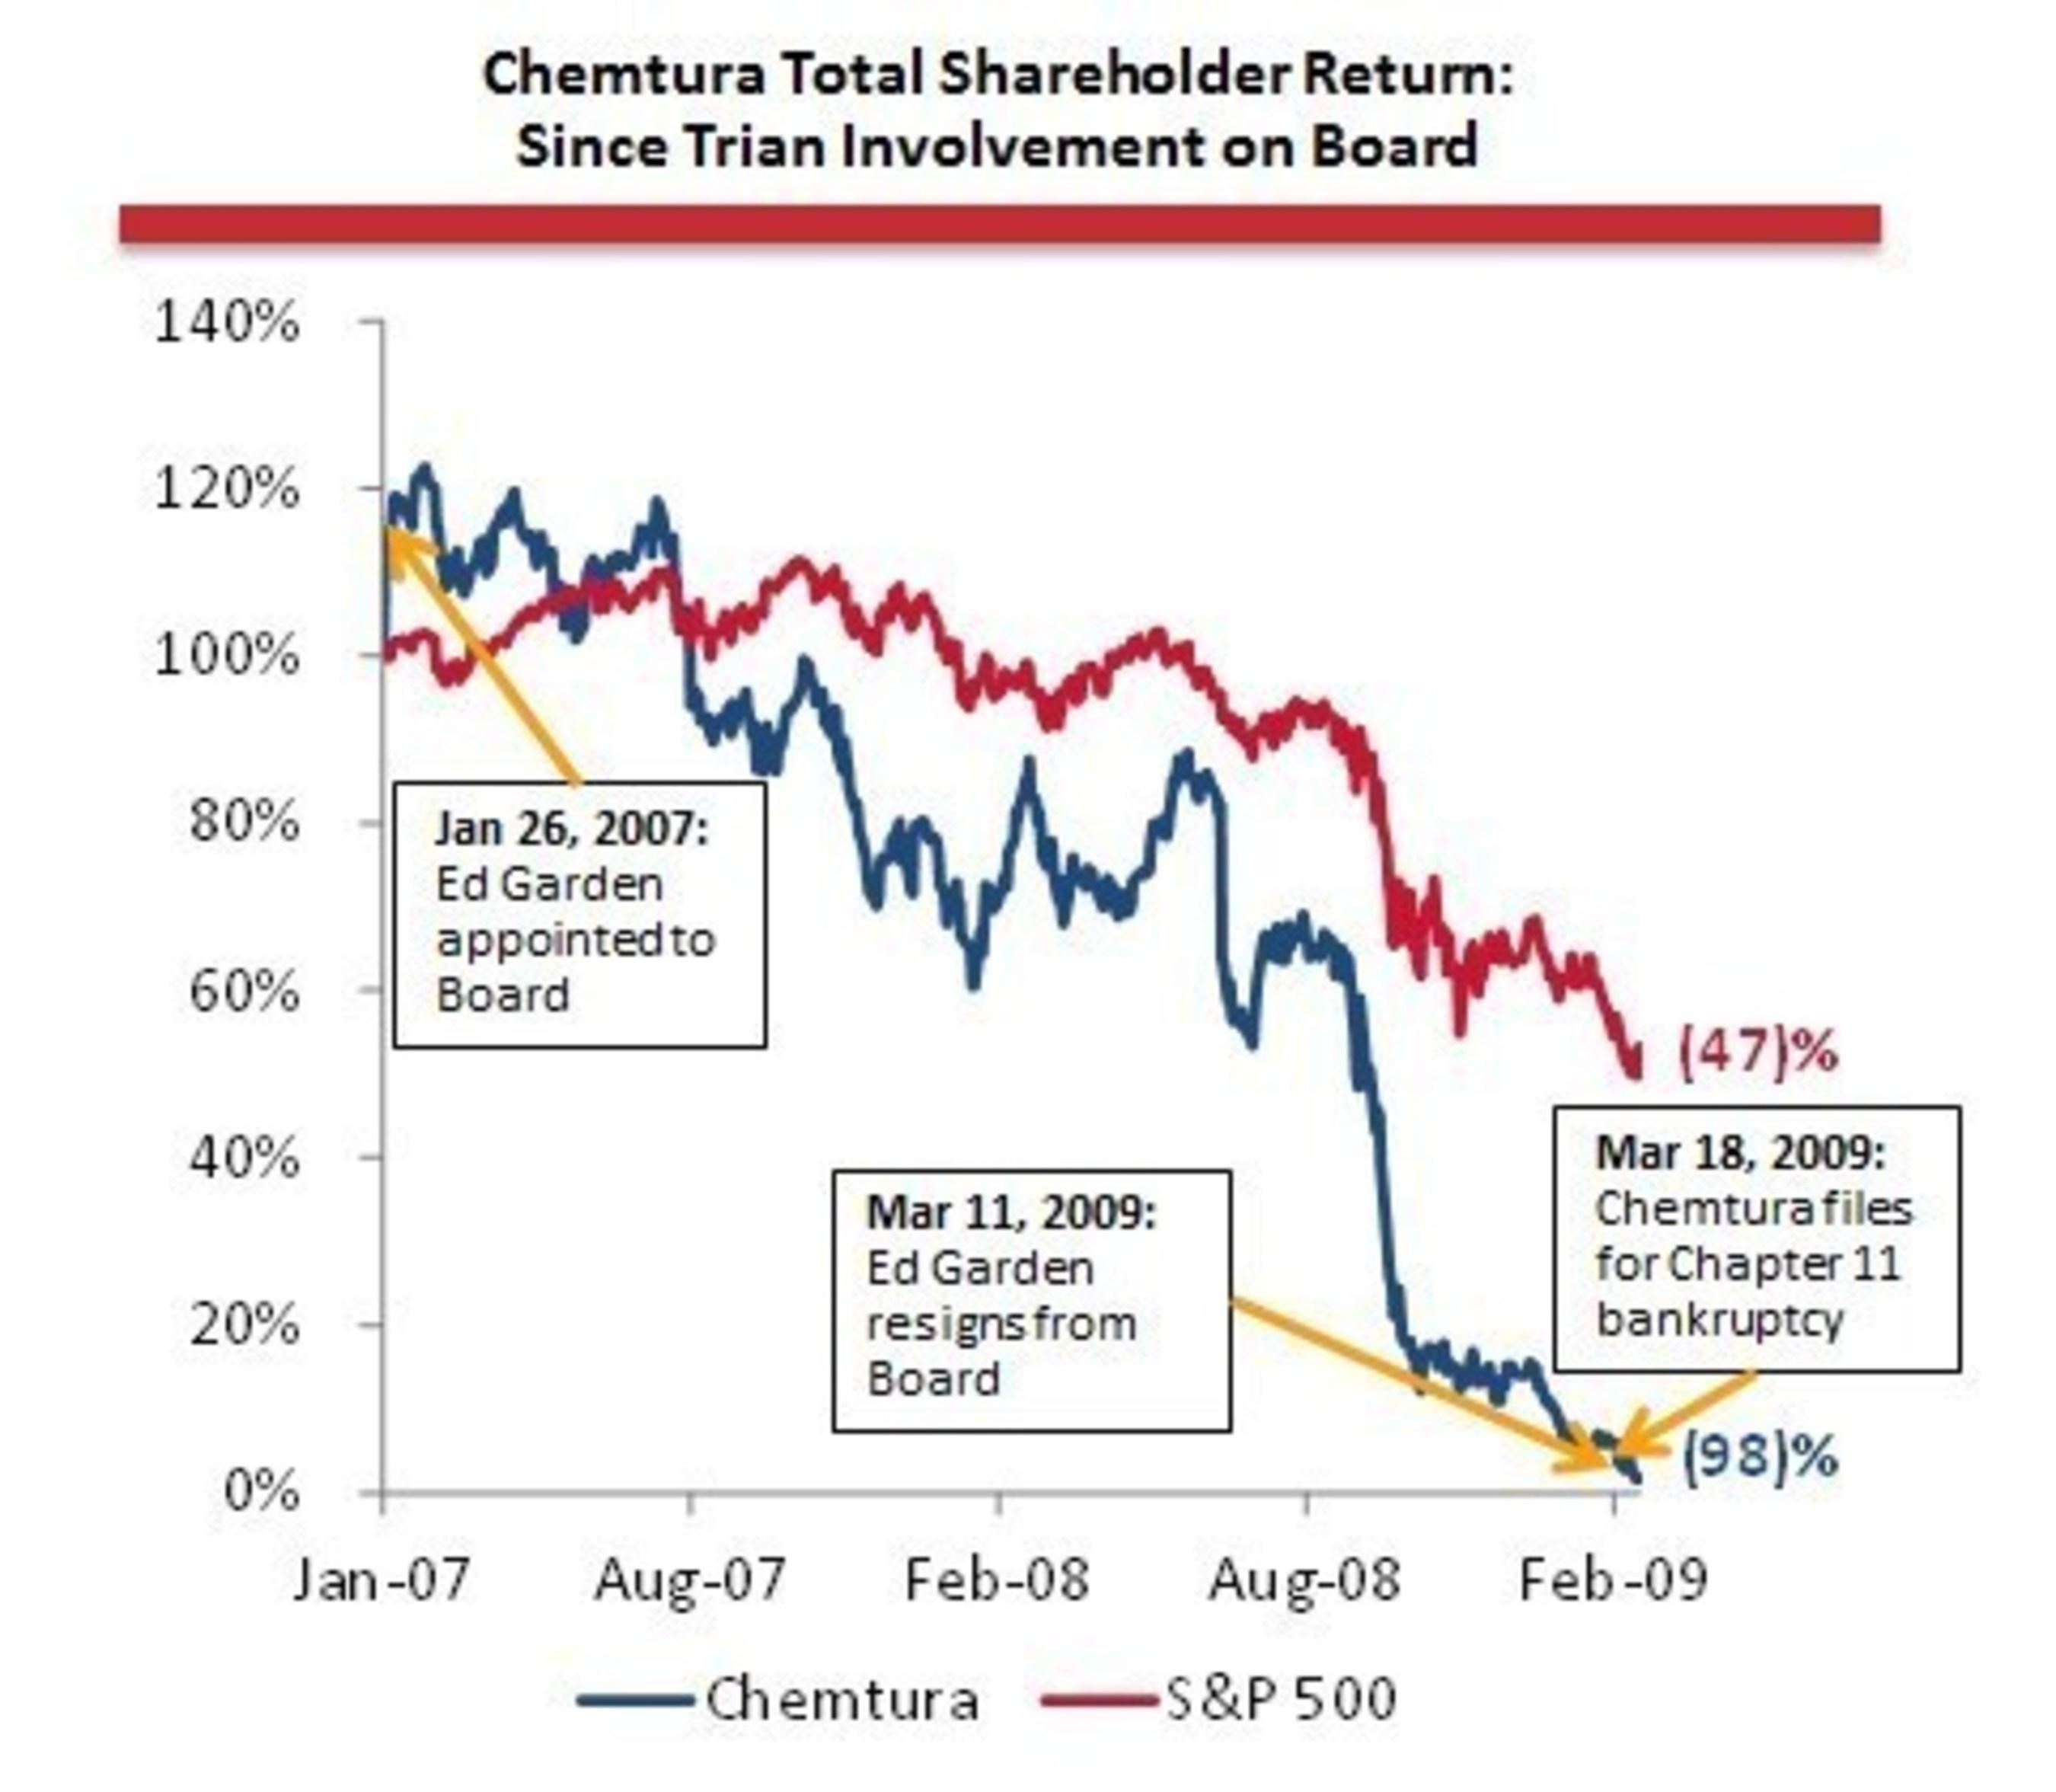 Chemtura Total Shareholder Return: Since Trian Involvement on Board